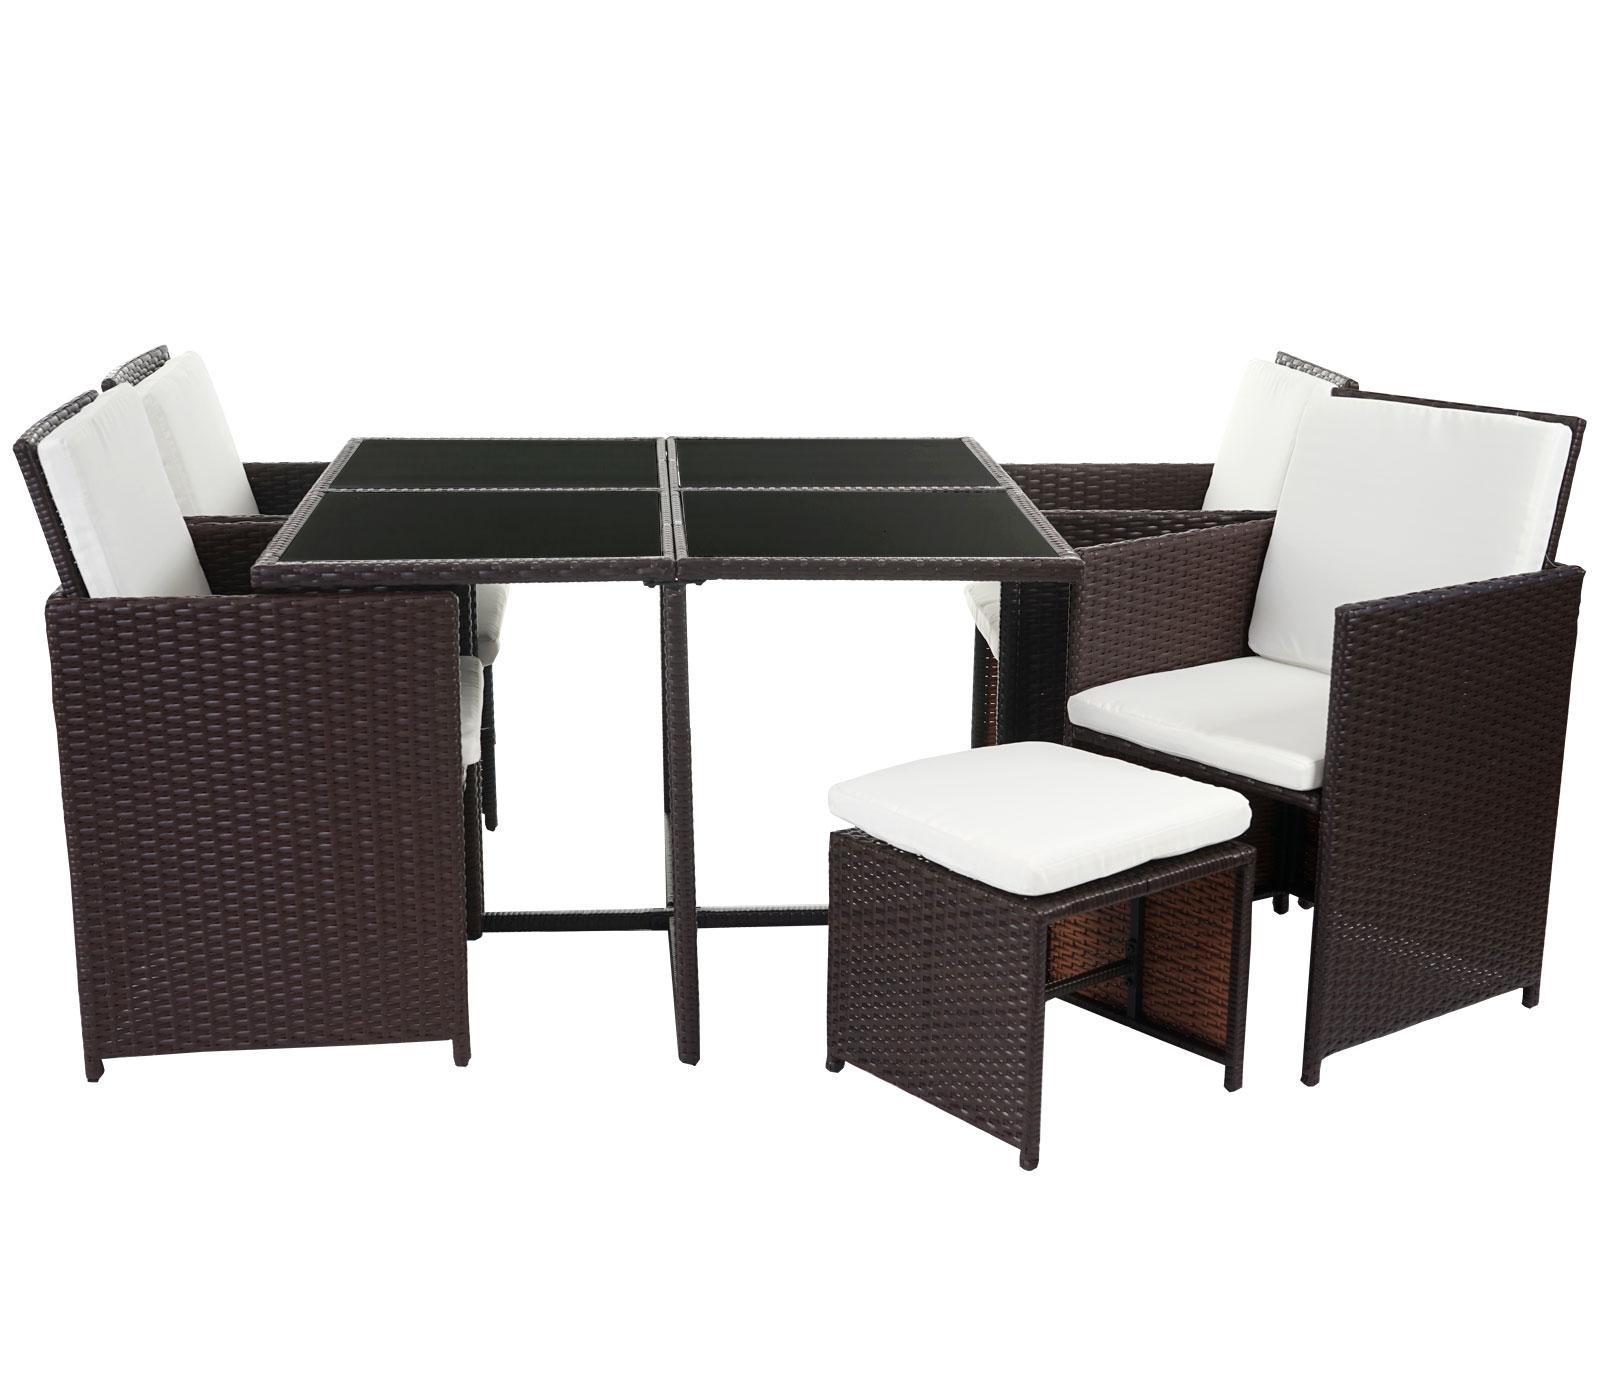 lounge set garten outdoor dusche rattan plush design. Black Bedroom Furniture Sets. Home Design Ideas